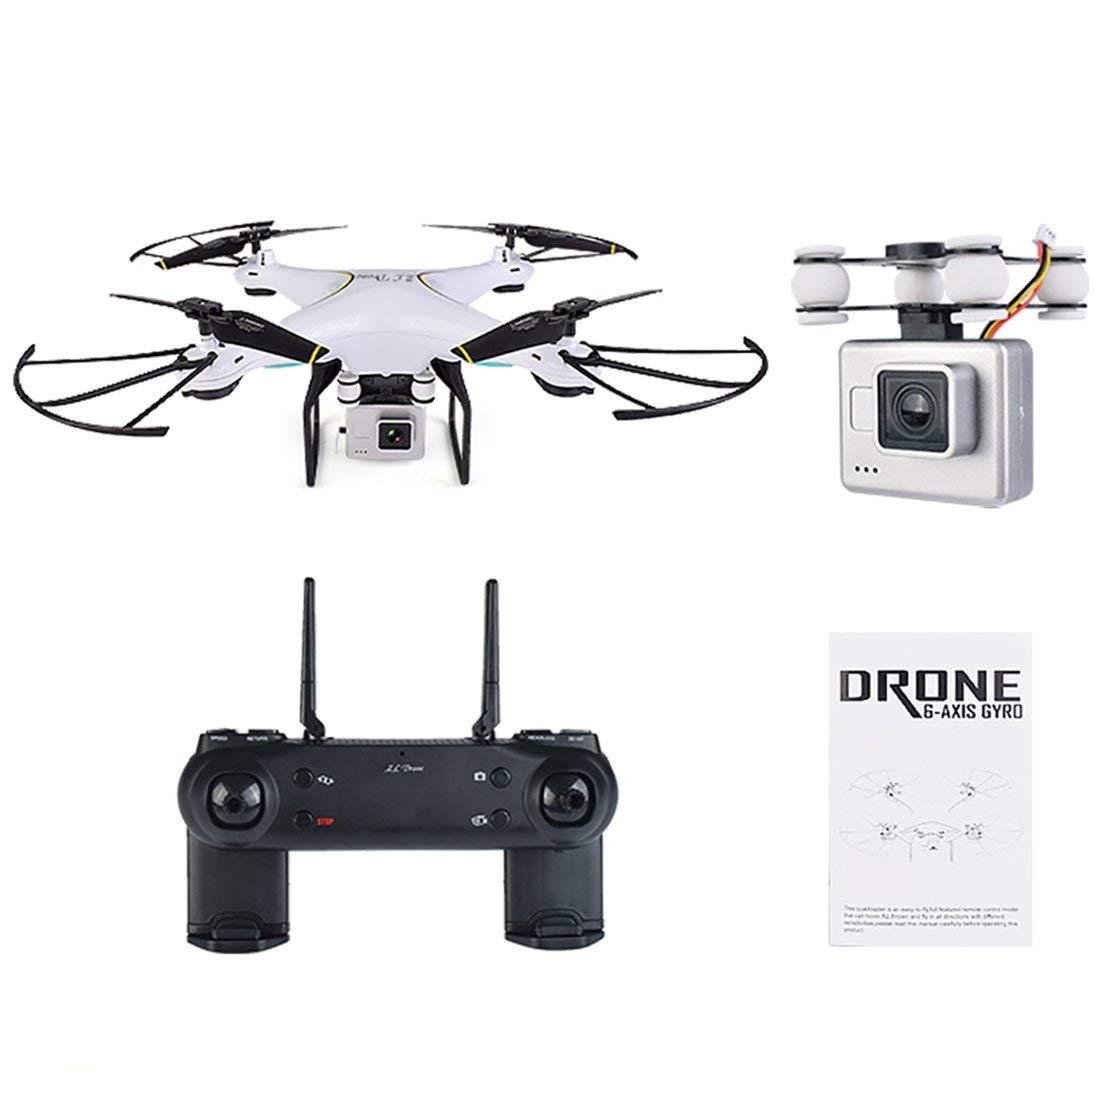 Formulaone SG600 RC Drone con cámara 2MP WiFi FPV Quadcopter Auto Return Altitude - Blanco